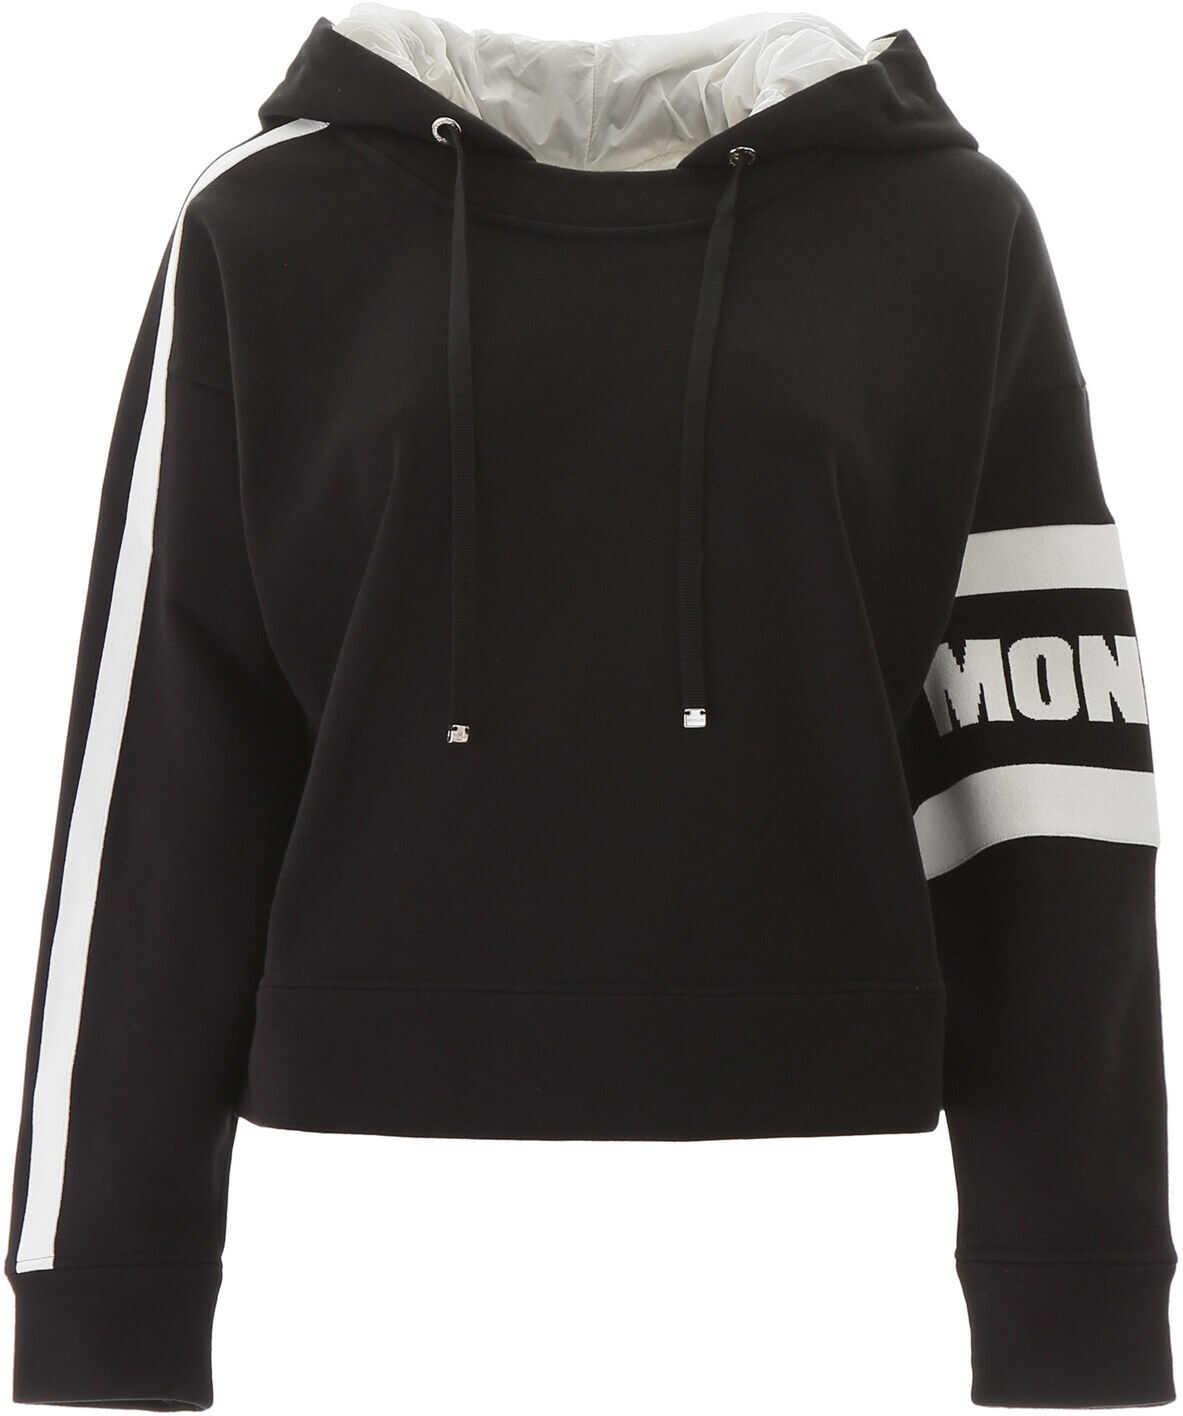 Moncler Basic Hooded Sweatshirt NERO